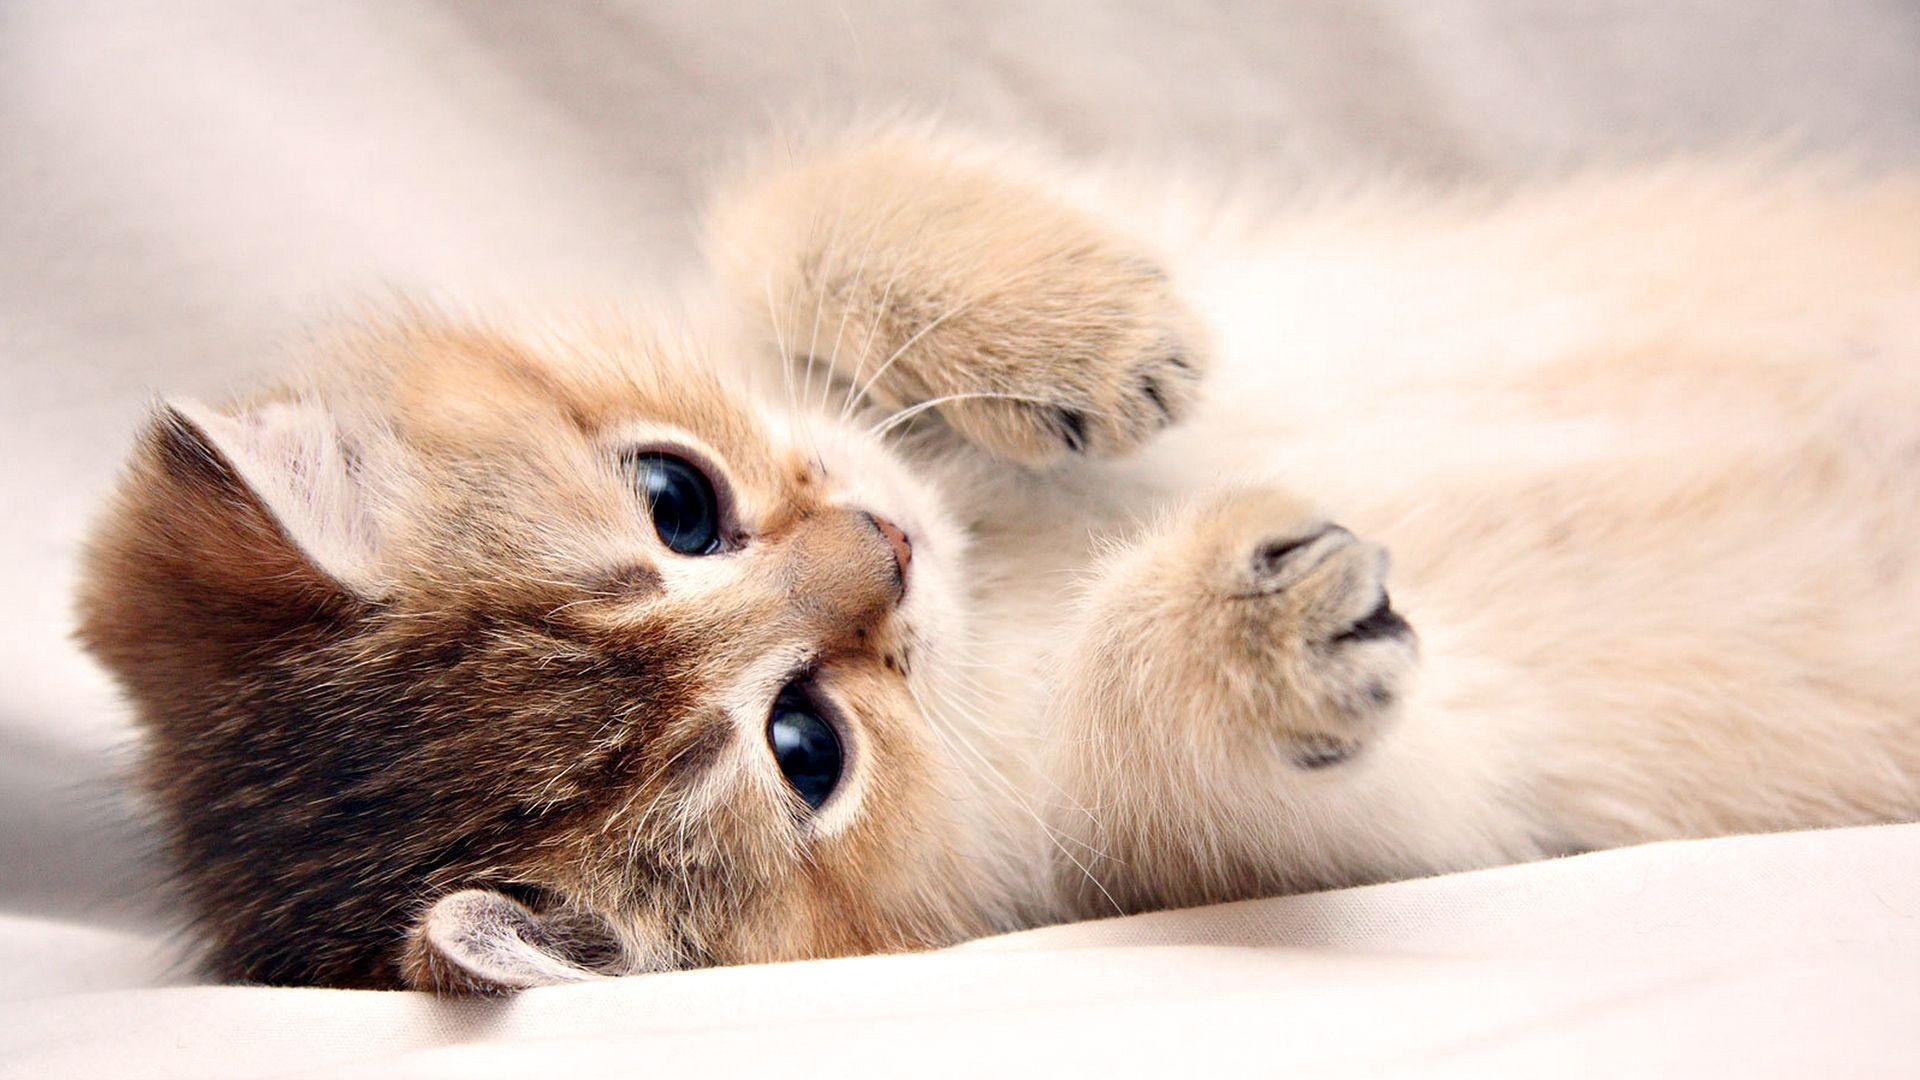 Lovely Cute Kitten Kitty Pictures Free Cell Ph 6178 Wallpaper Kittens Cutest Cute Cat Wallpaper Kitten Wallpaper